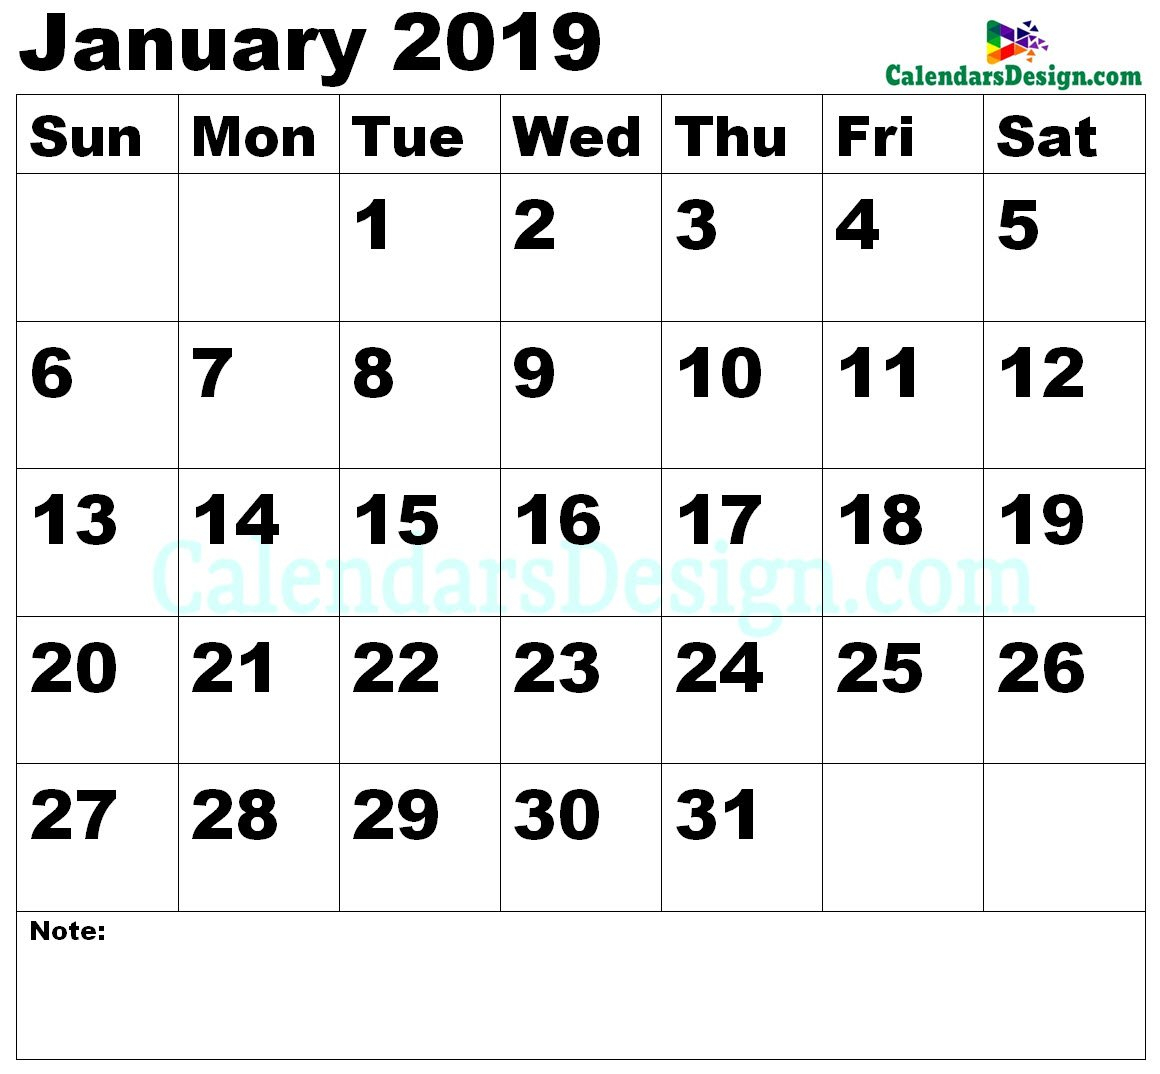 Vertex January Calendar 2019 Printable - Free 2019 Printable Calendar 2019 Vertex